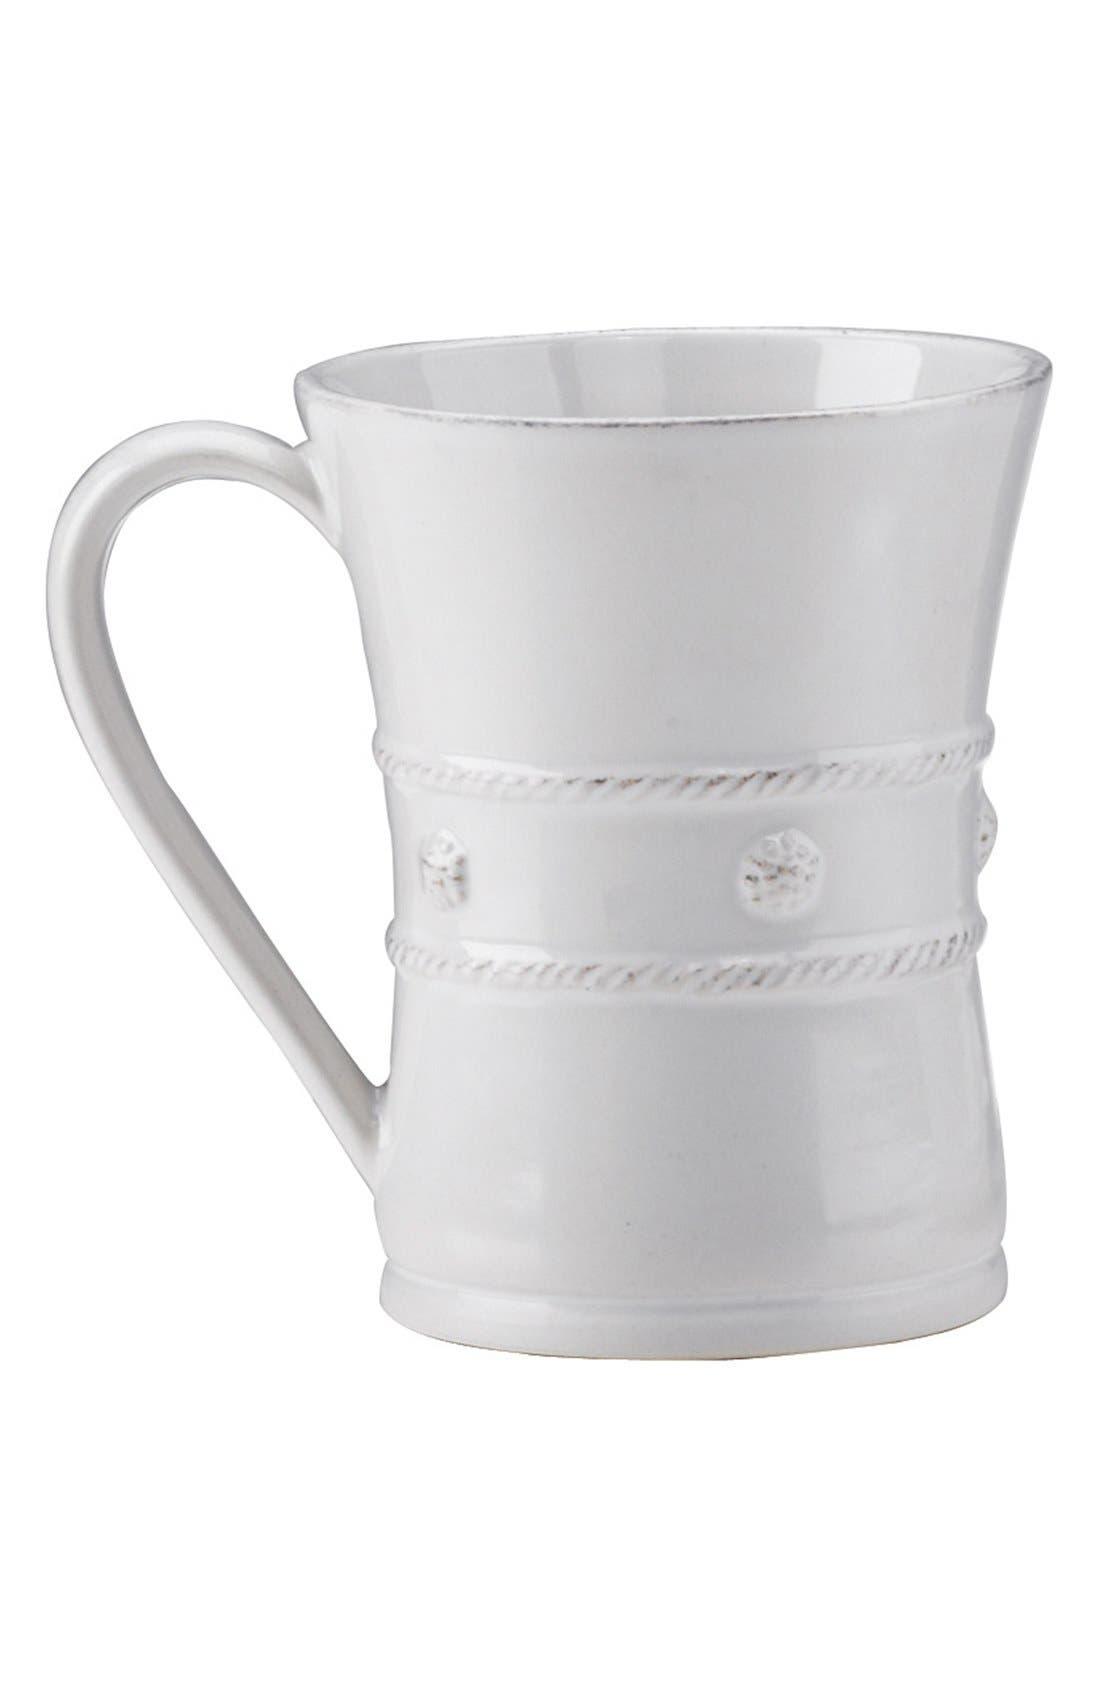 'Berry and Thread' Ceramic Coffee Mug,                             Main thumbnail 1, color,                             WHITEWASH